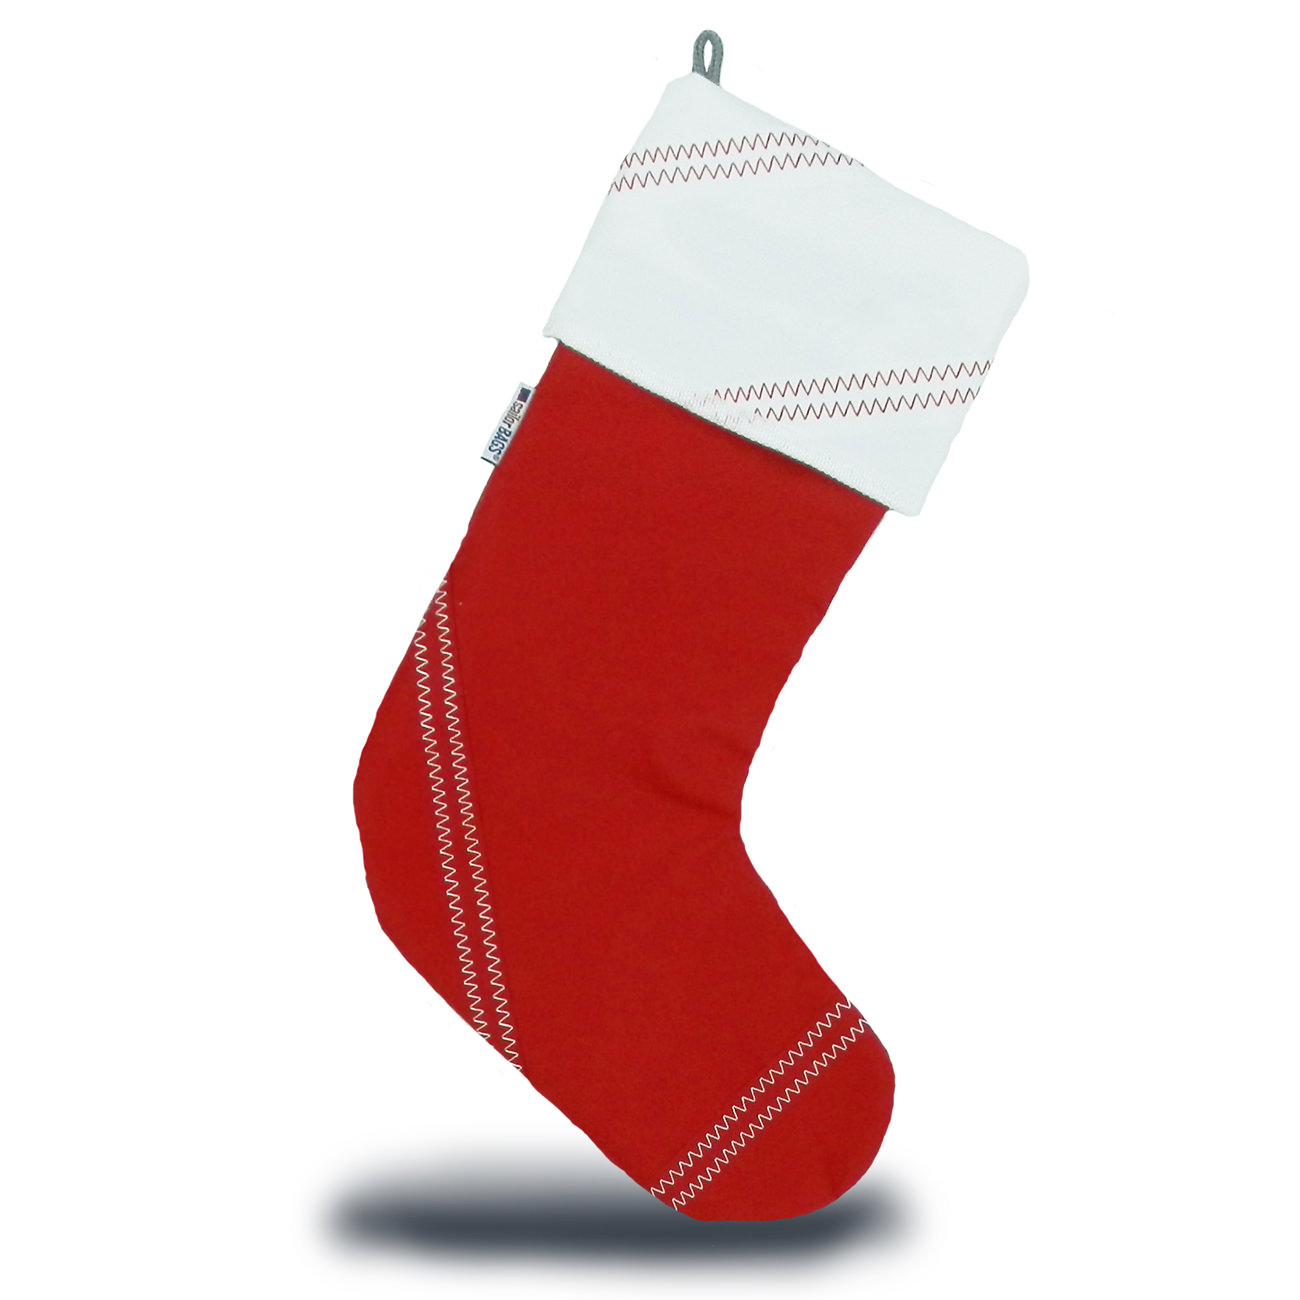 Idyllic Chesapeake Stocking Chesapeake Stocking Schooner Chandlery Bulk Stockings Sale Stocking Sale Personalized baby Christmas Stockings Sale